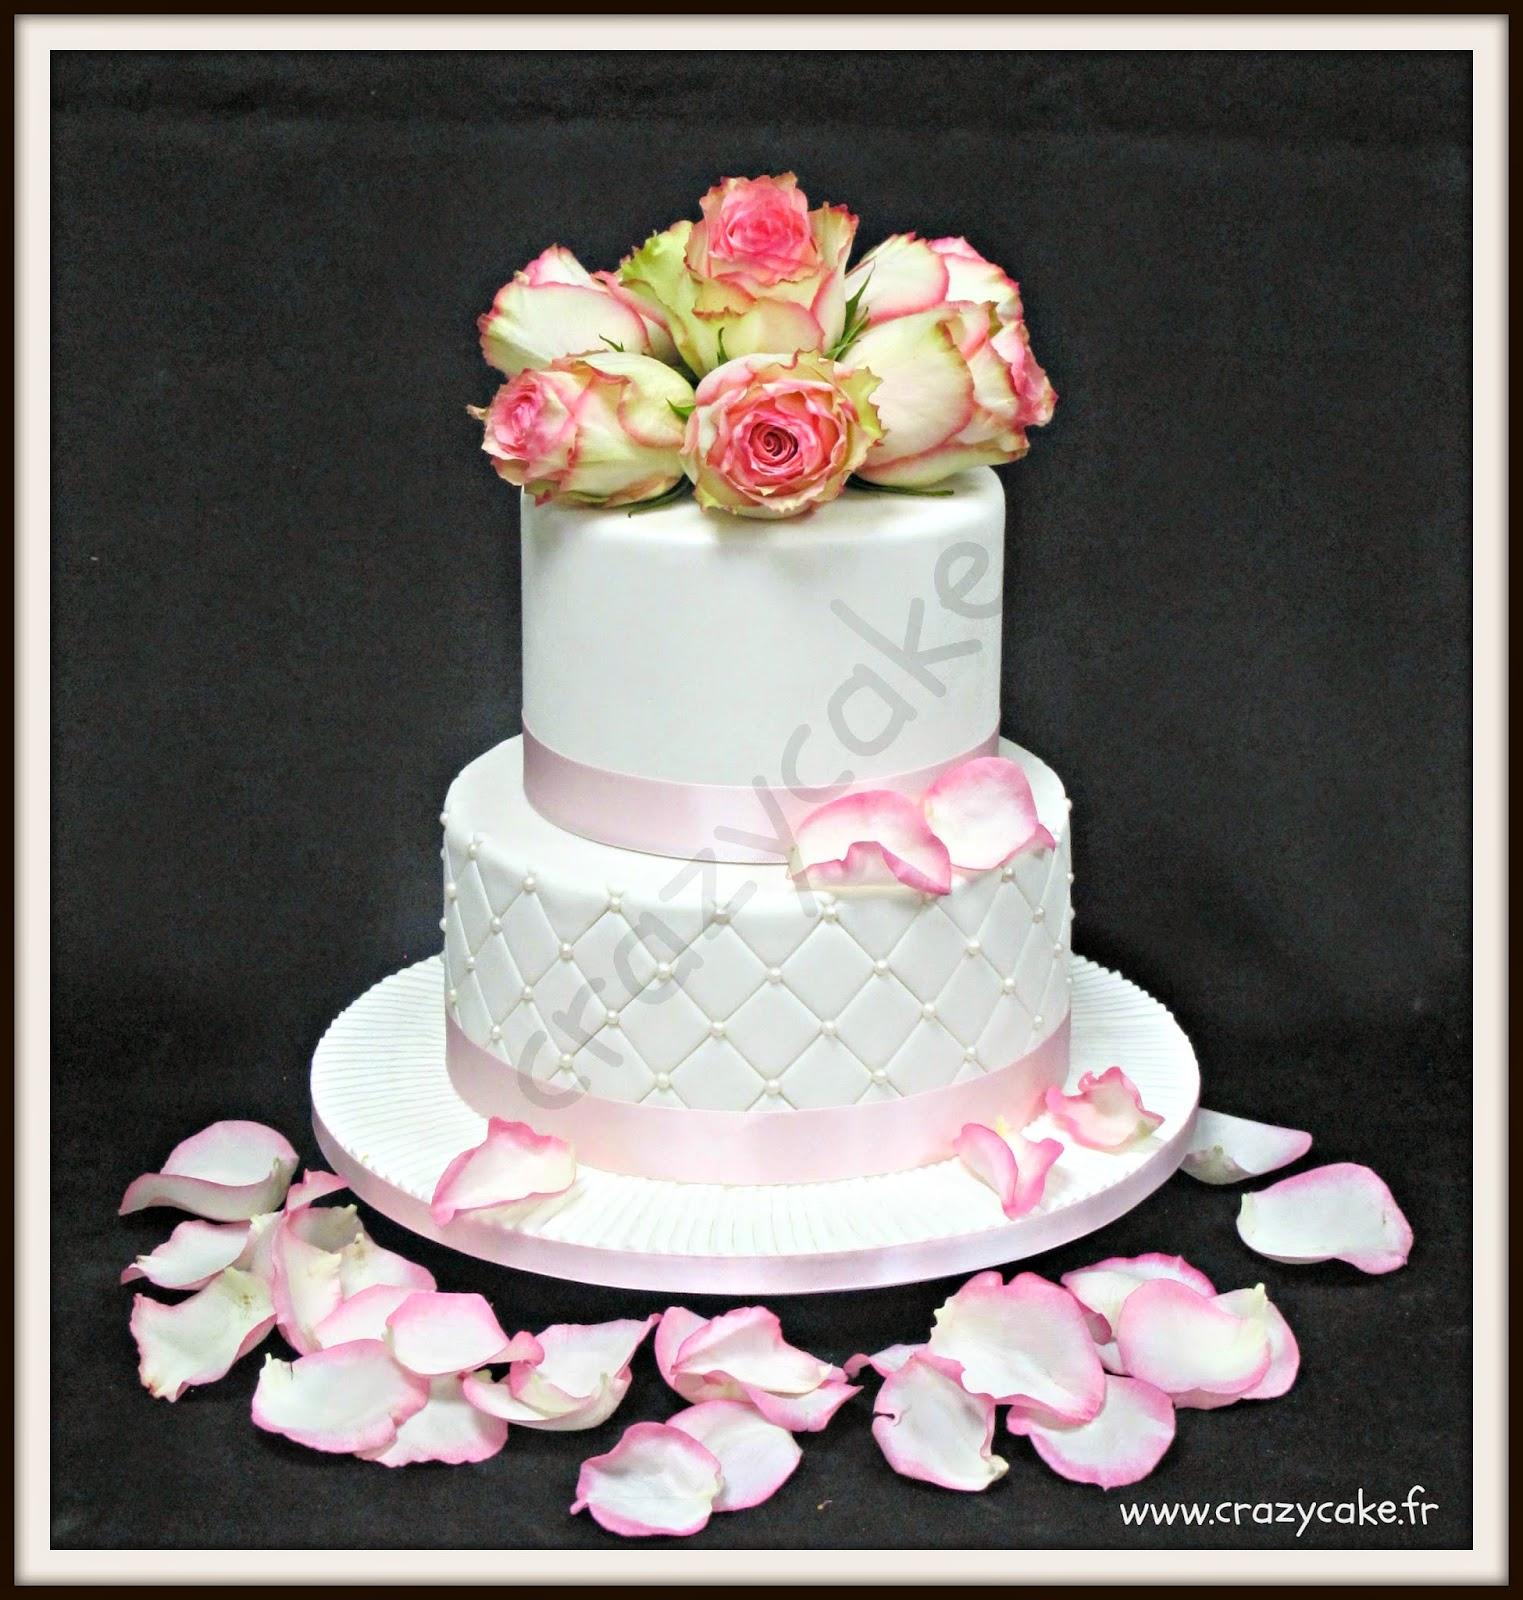 CRAZY CAKE - CAKE DESIGN, THIONVILLE, METZ, LUXEMBOURG: WEDDING CAKES